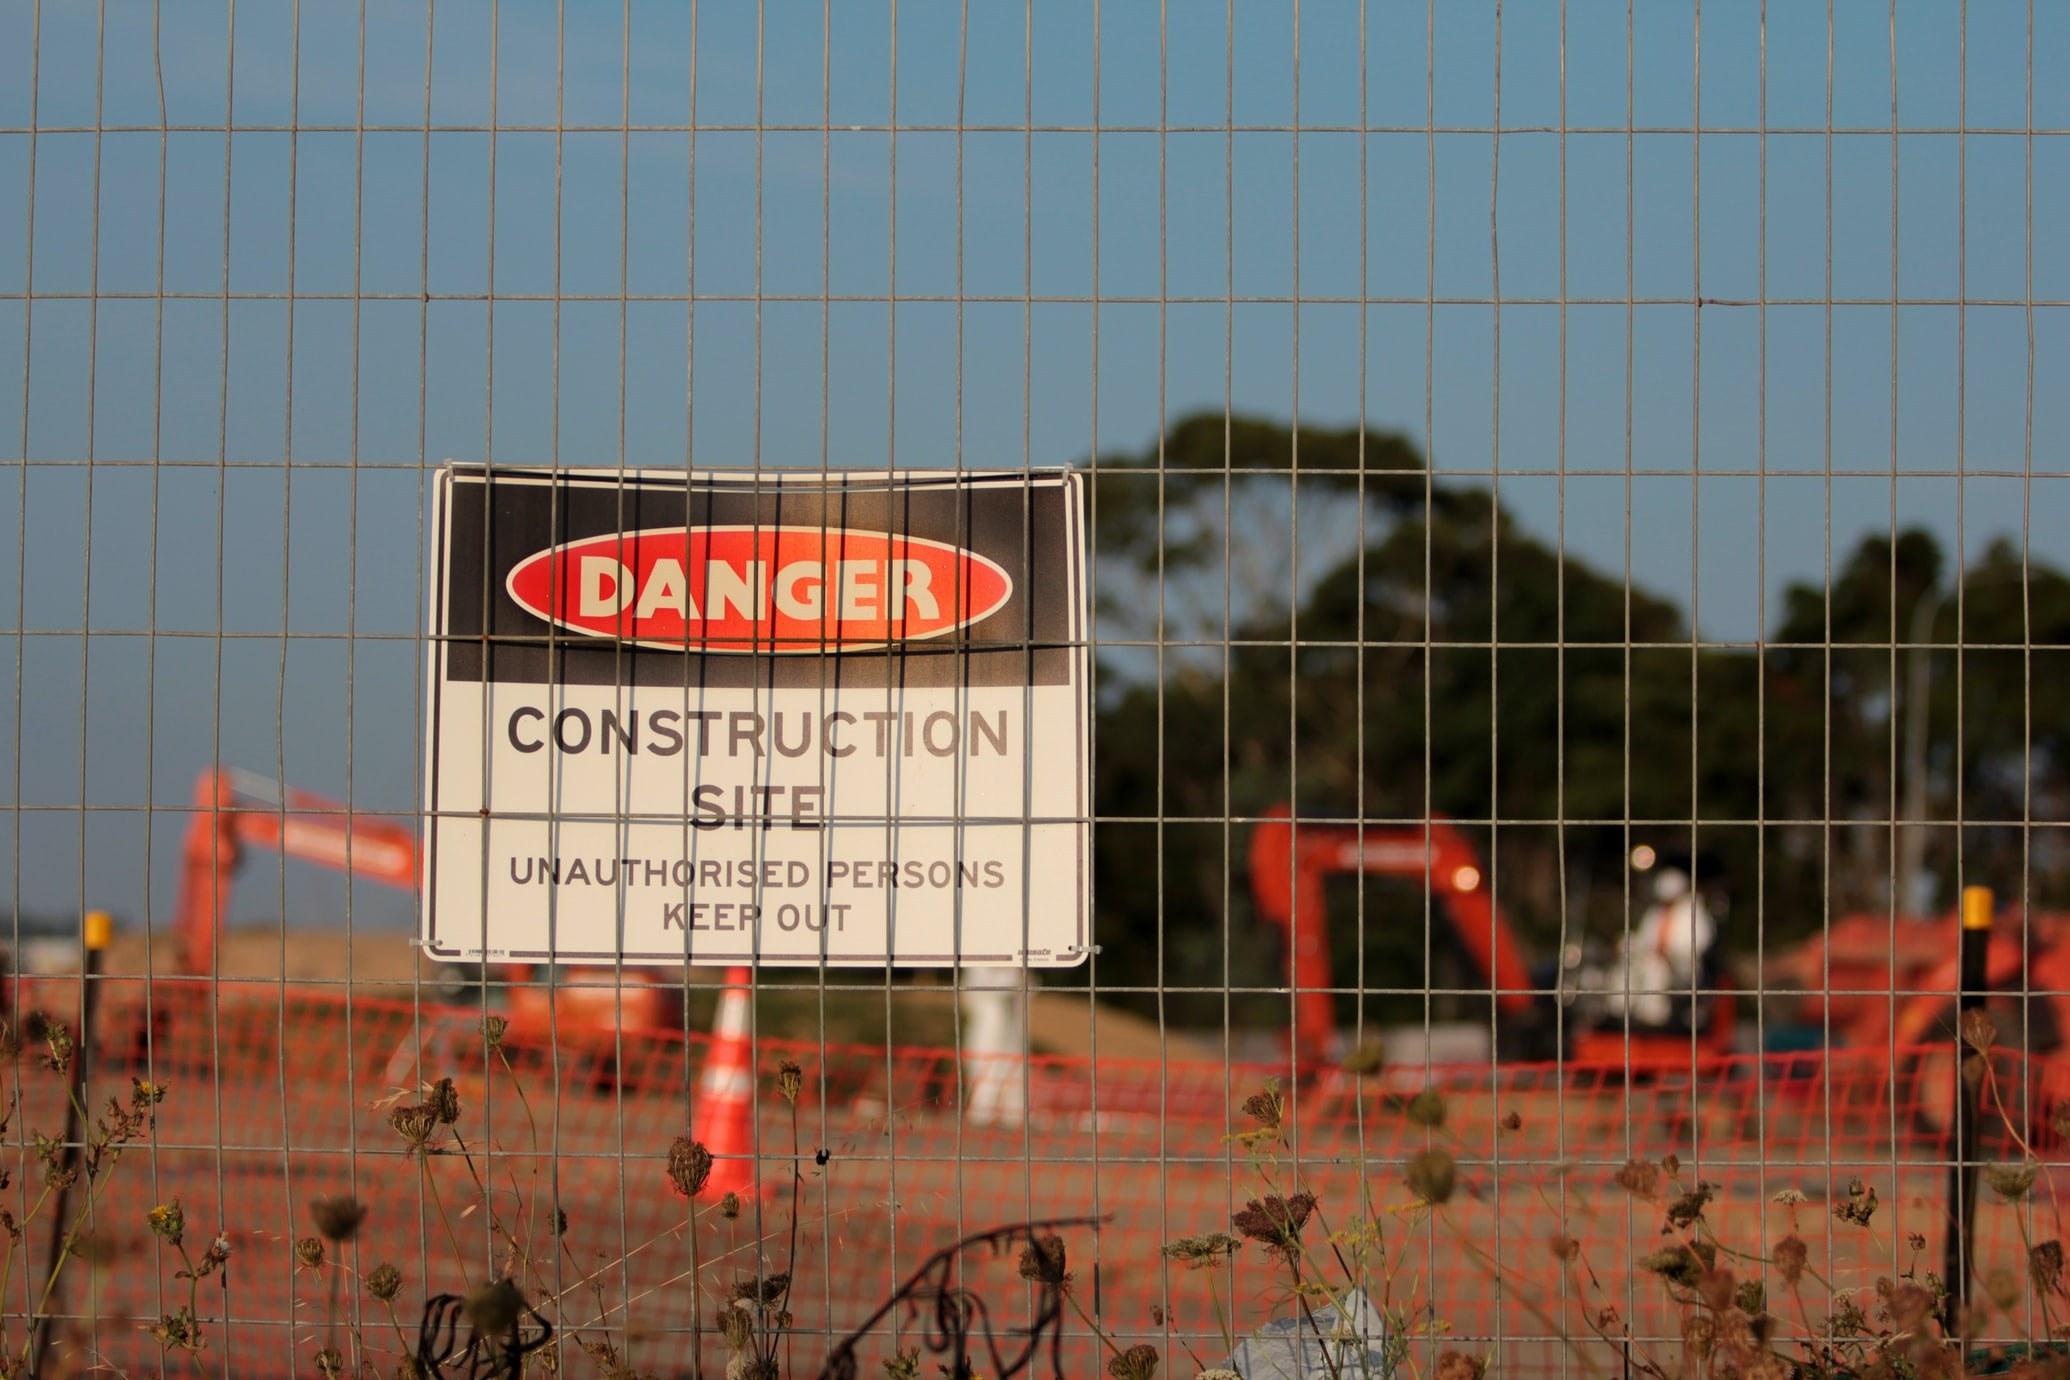 Danger sign behind construction site fence